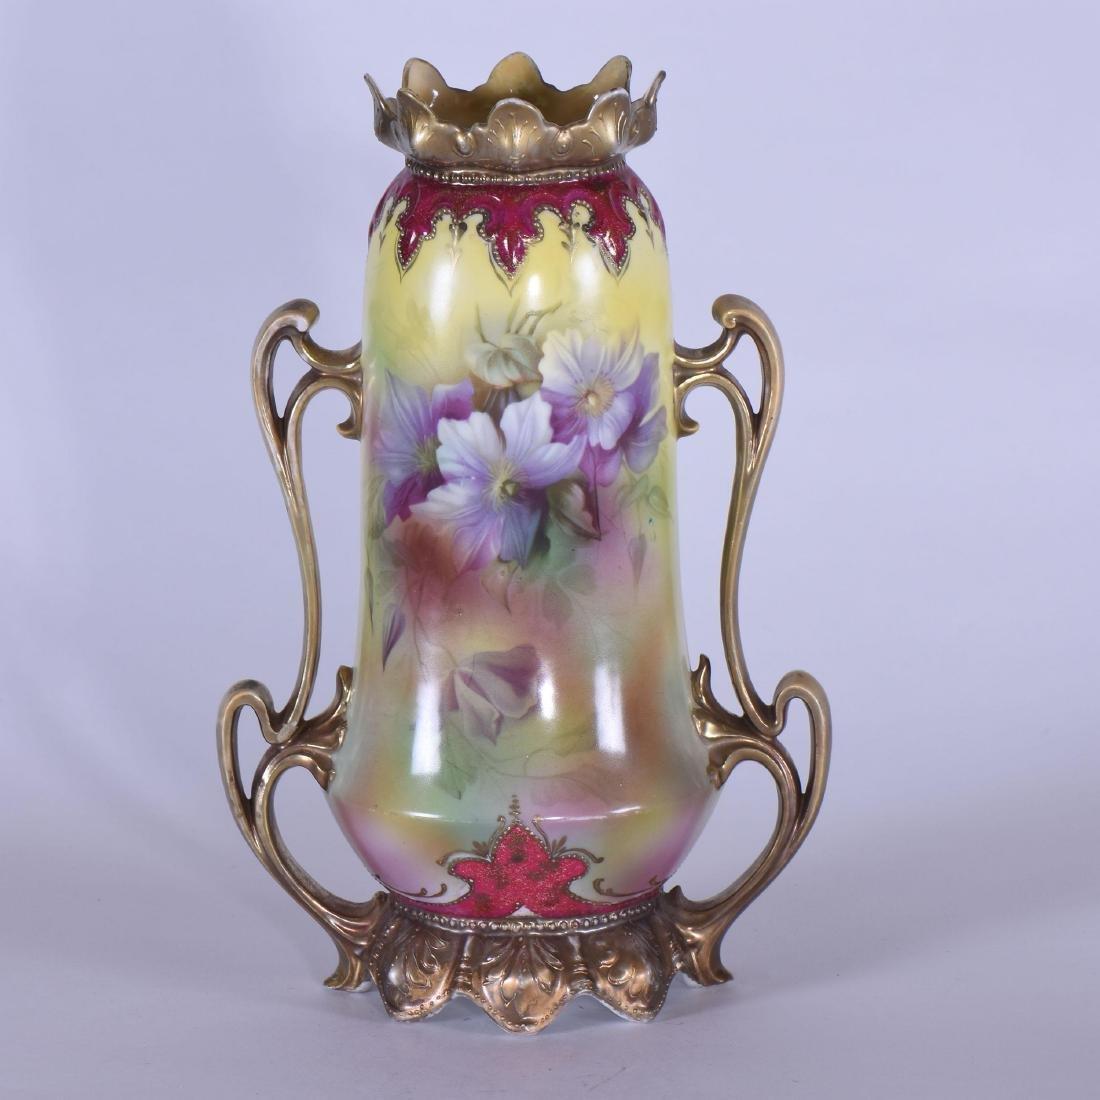 "Vase - Royal Vienna Mark - 11"" - 2"